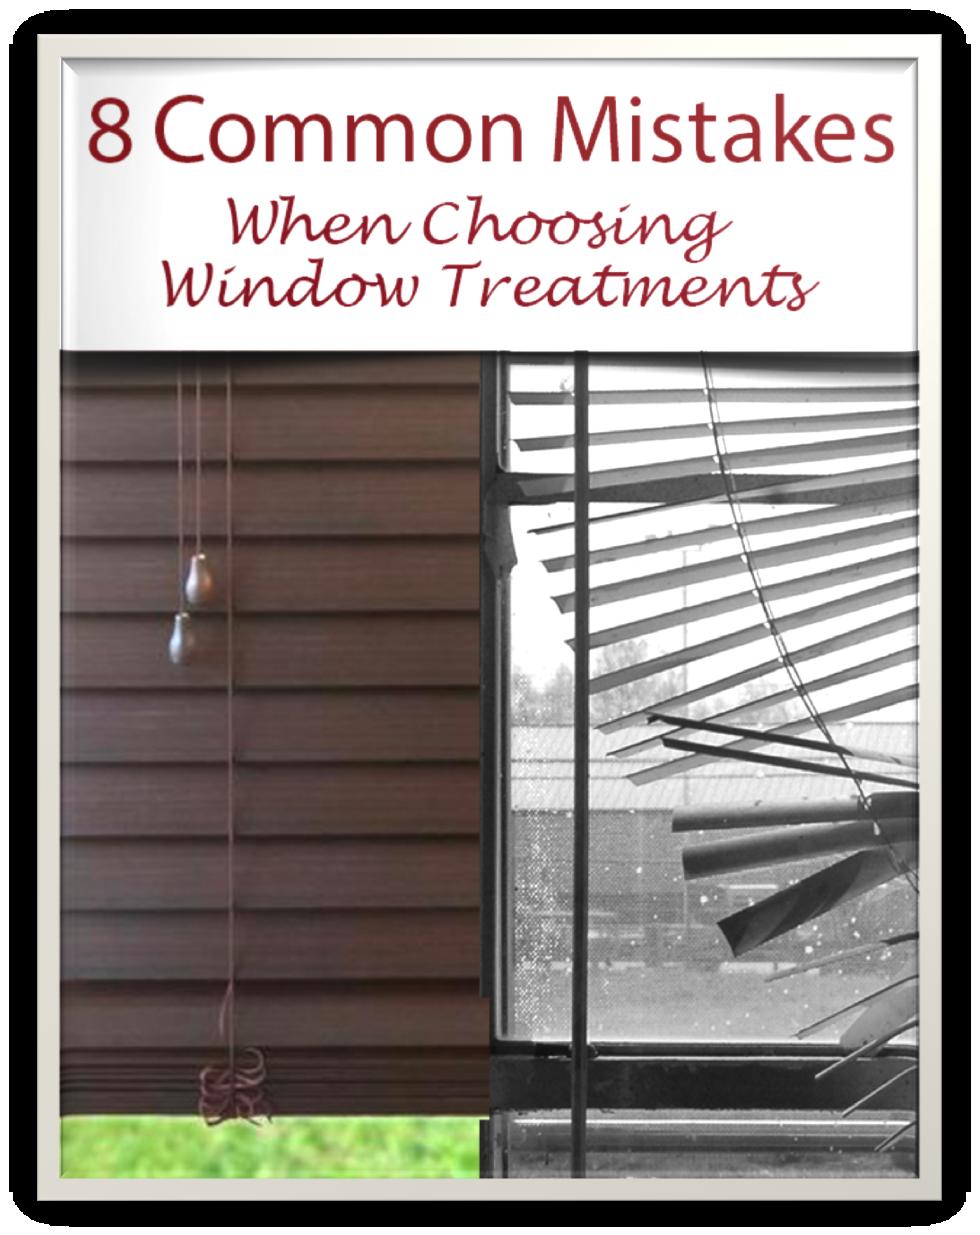 Common Window Treatment Mistakes